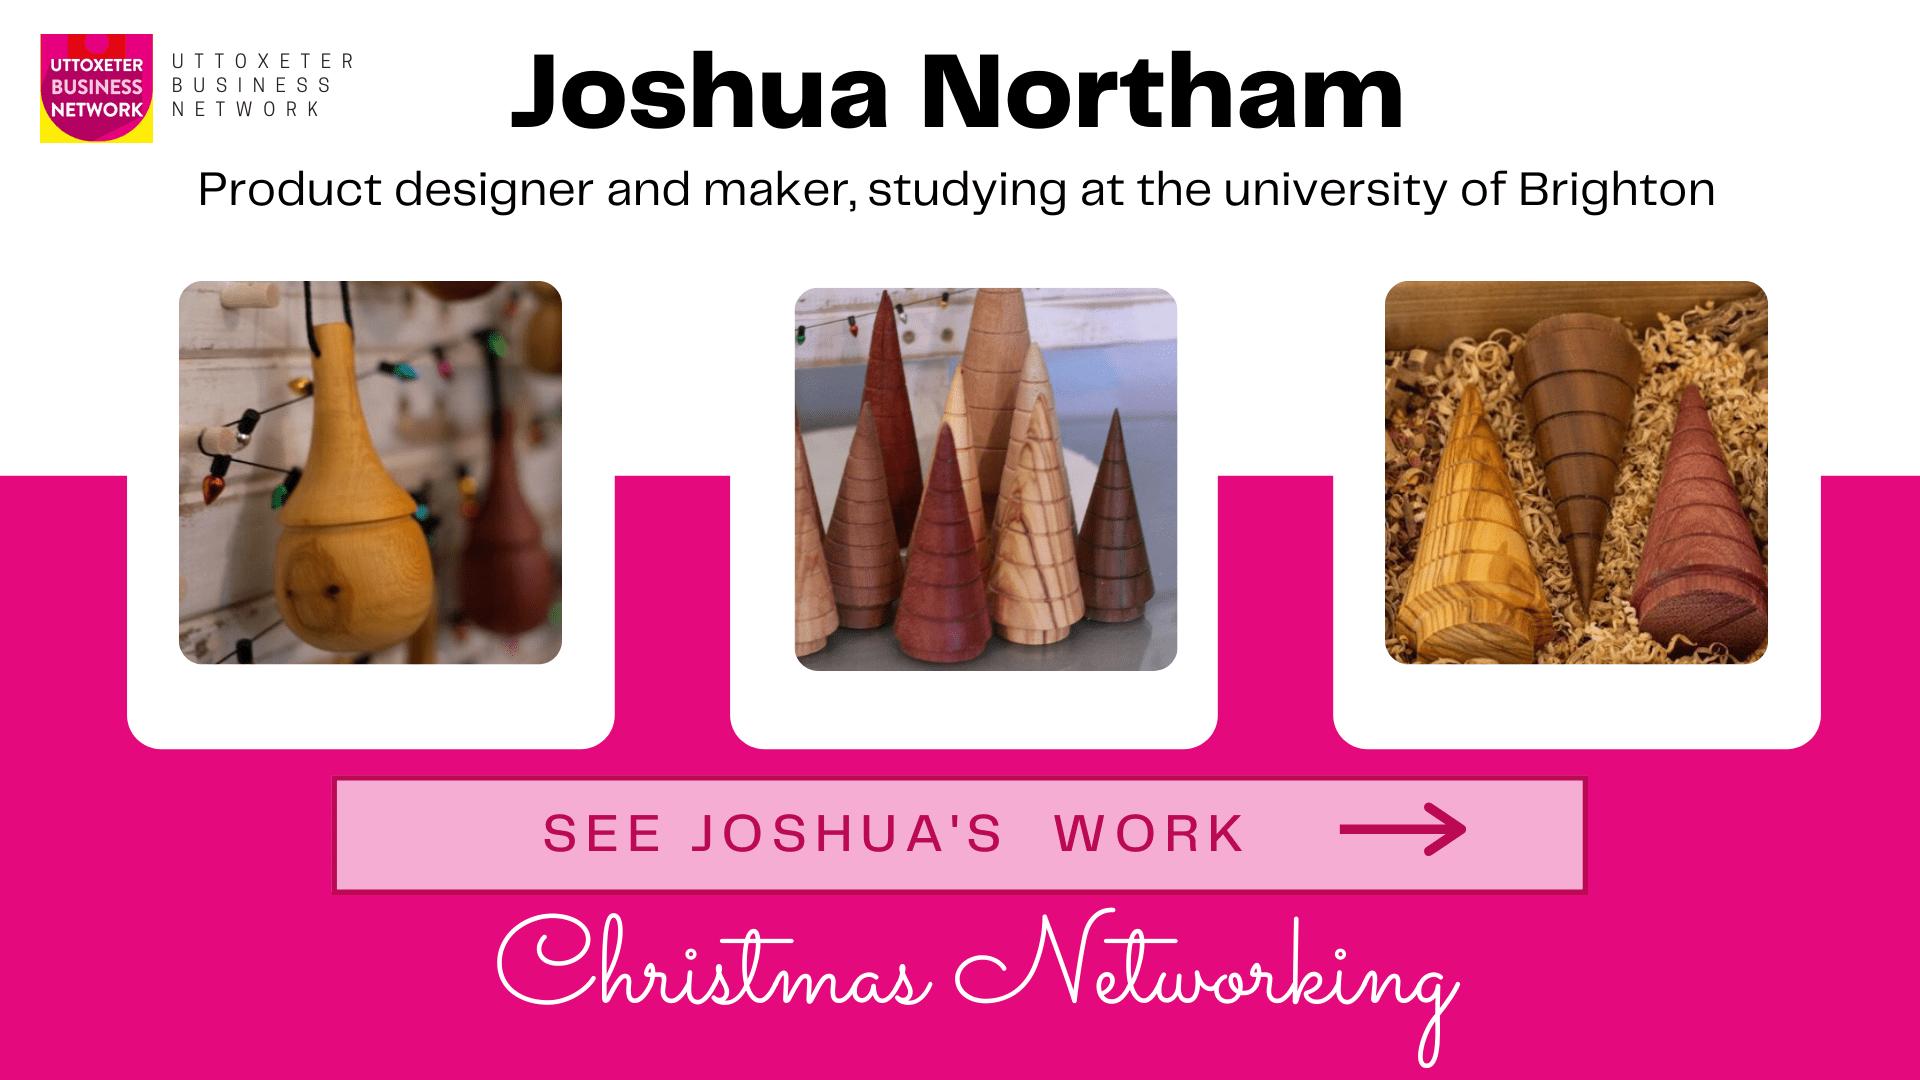 Joshua Northam - DOG HOUSE DESIGNS